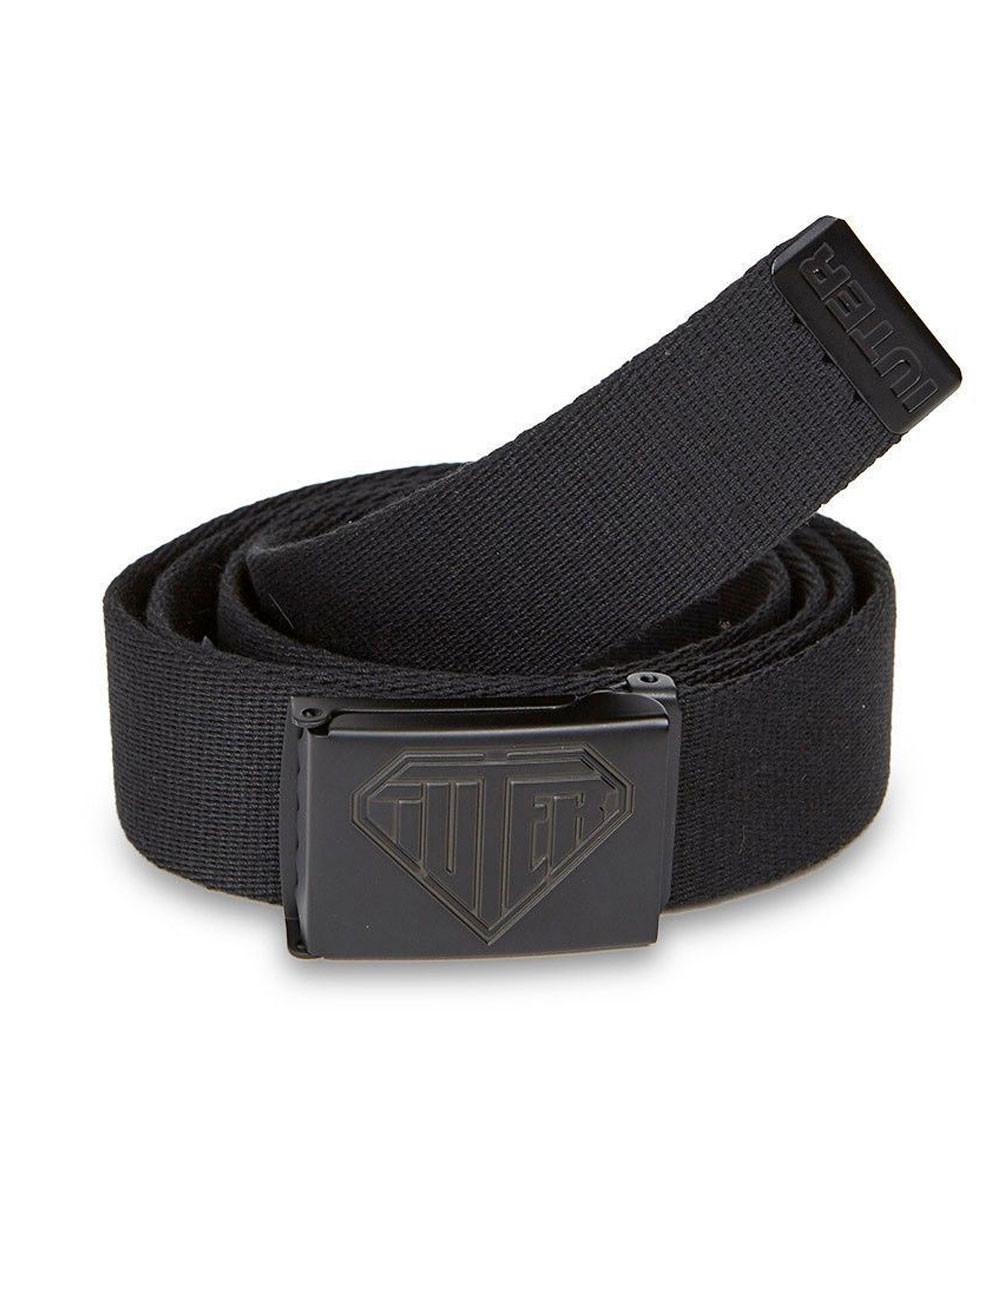 Iuter Milano est 2002 belt pack - 19WIBLP02 | Shapestore.it